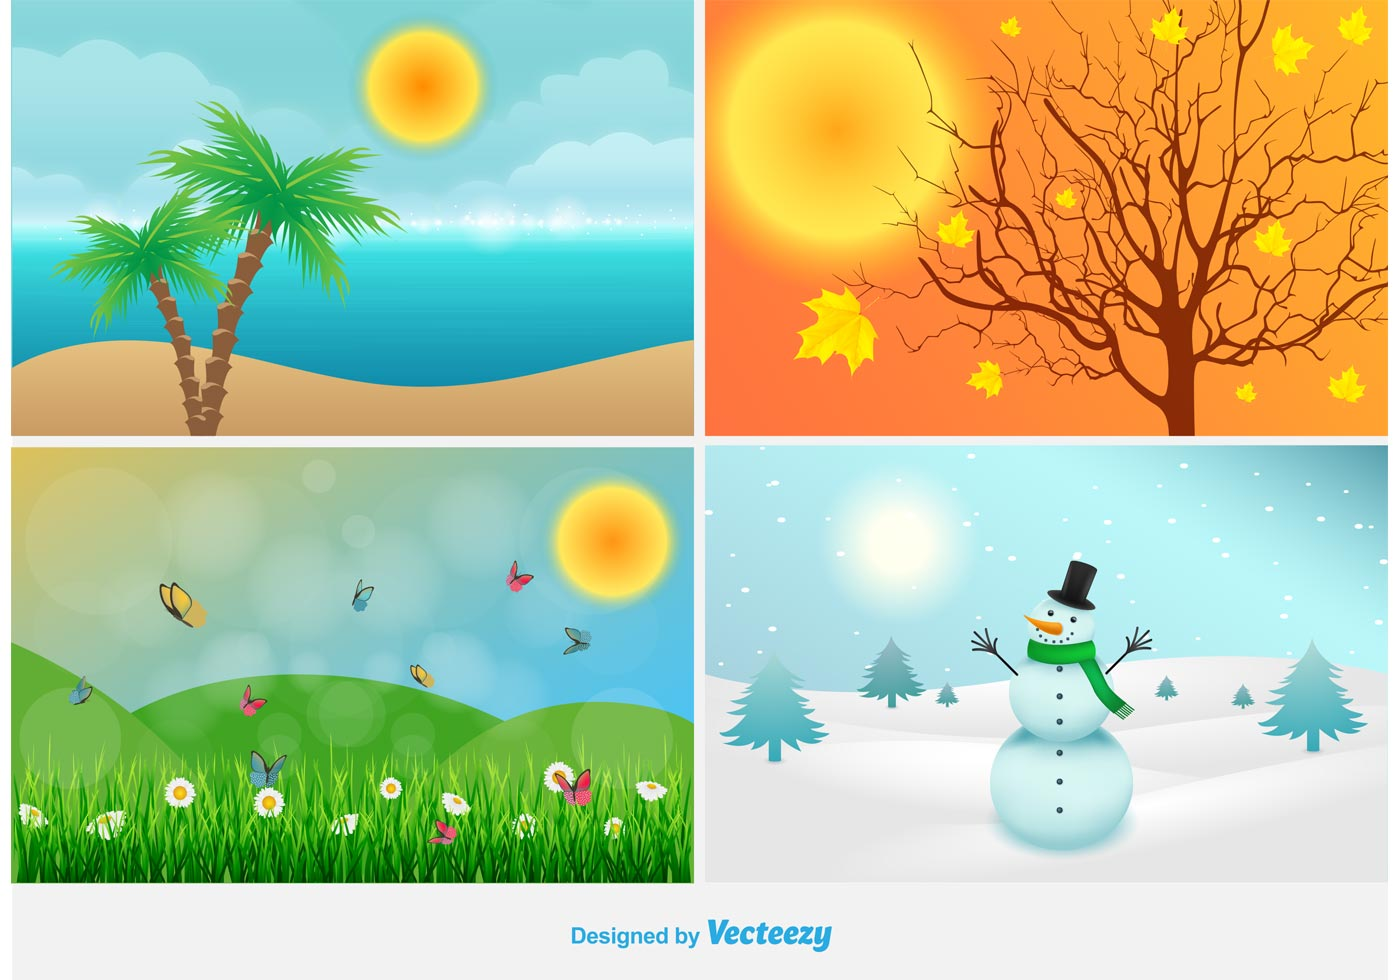 4 season clipart clip free library Four Seasons Free Vector Art - (38,269 Free Downloads) clip free library